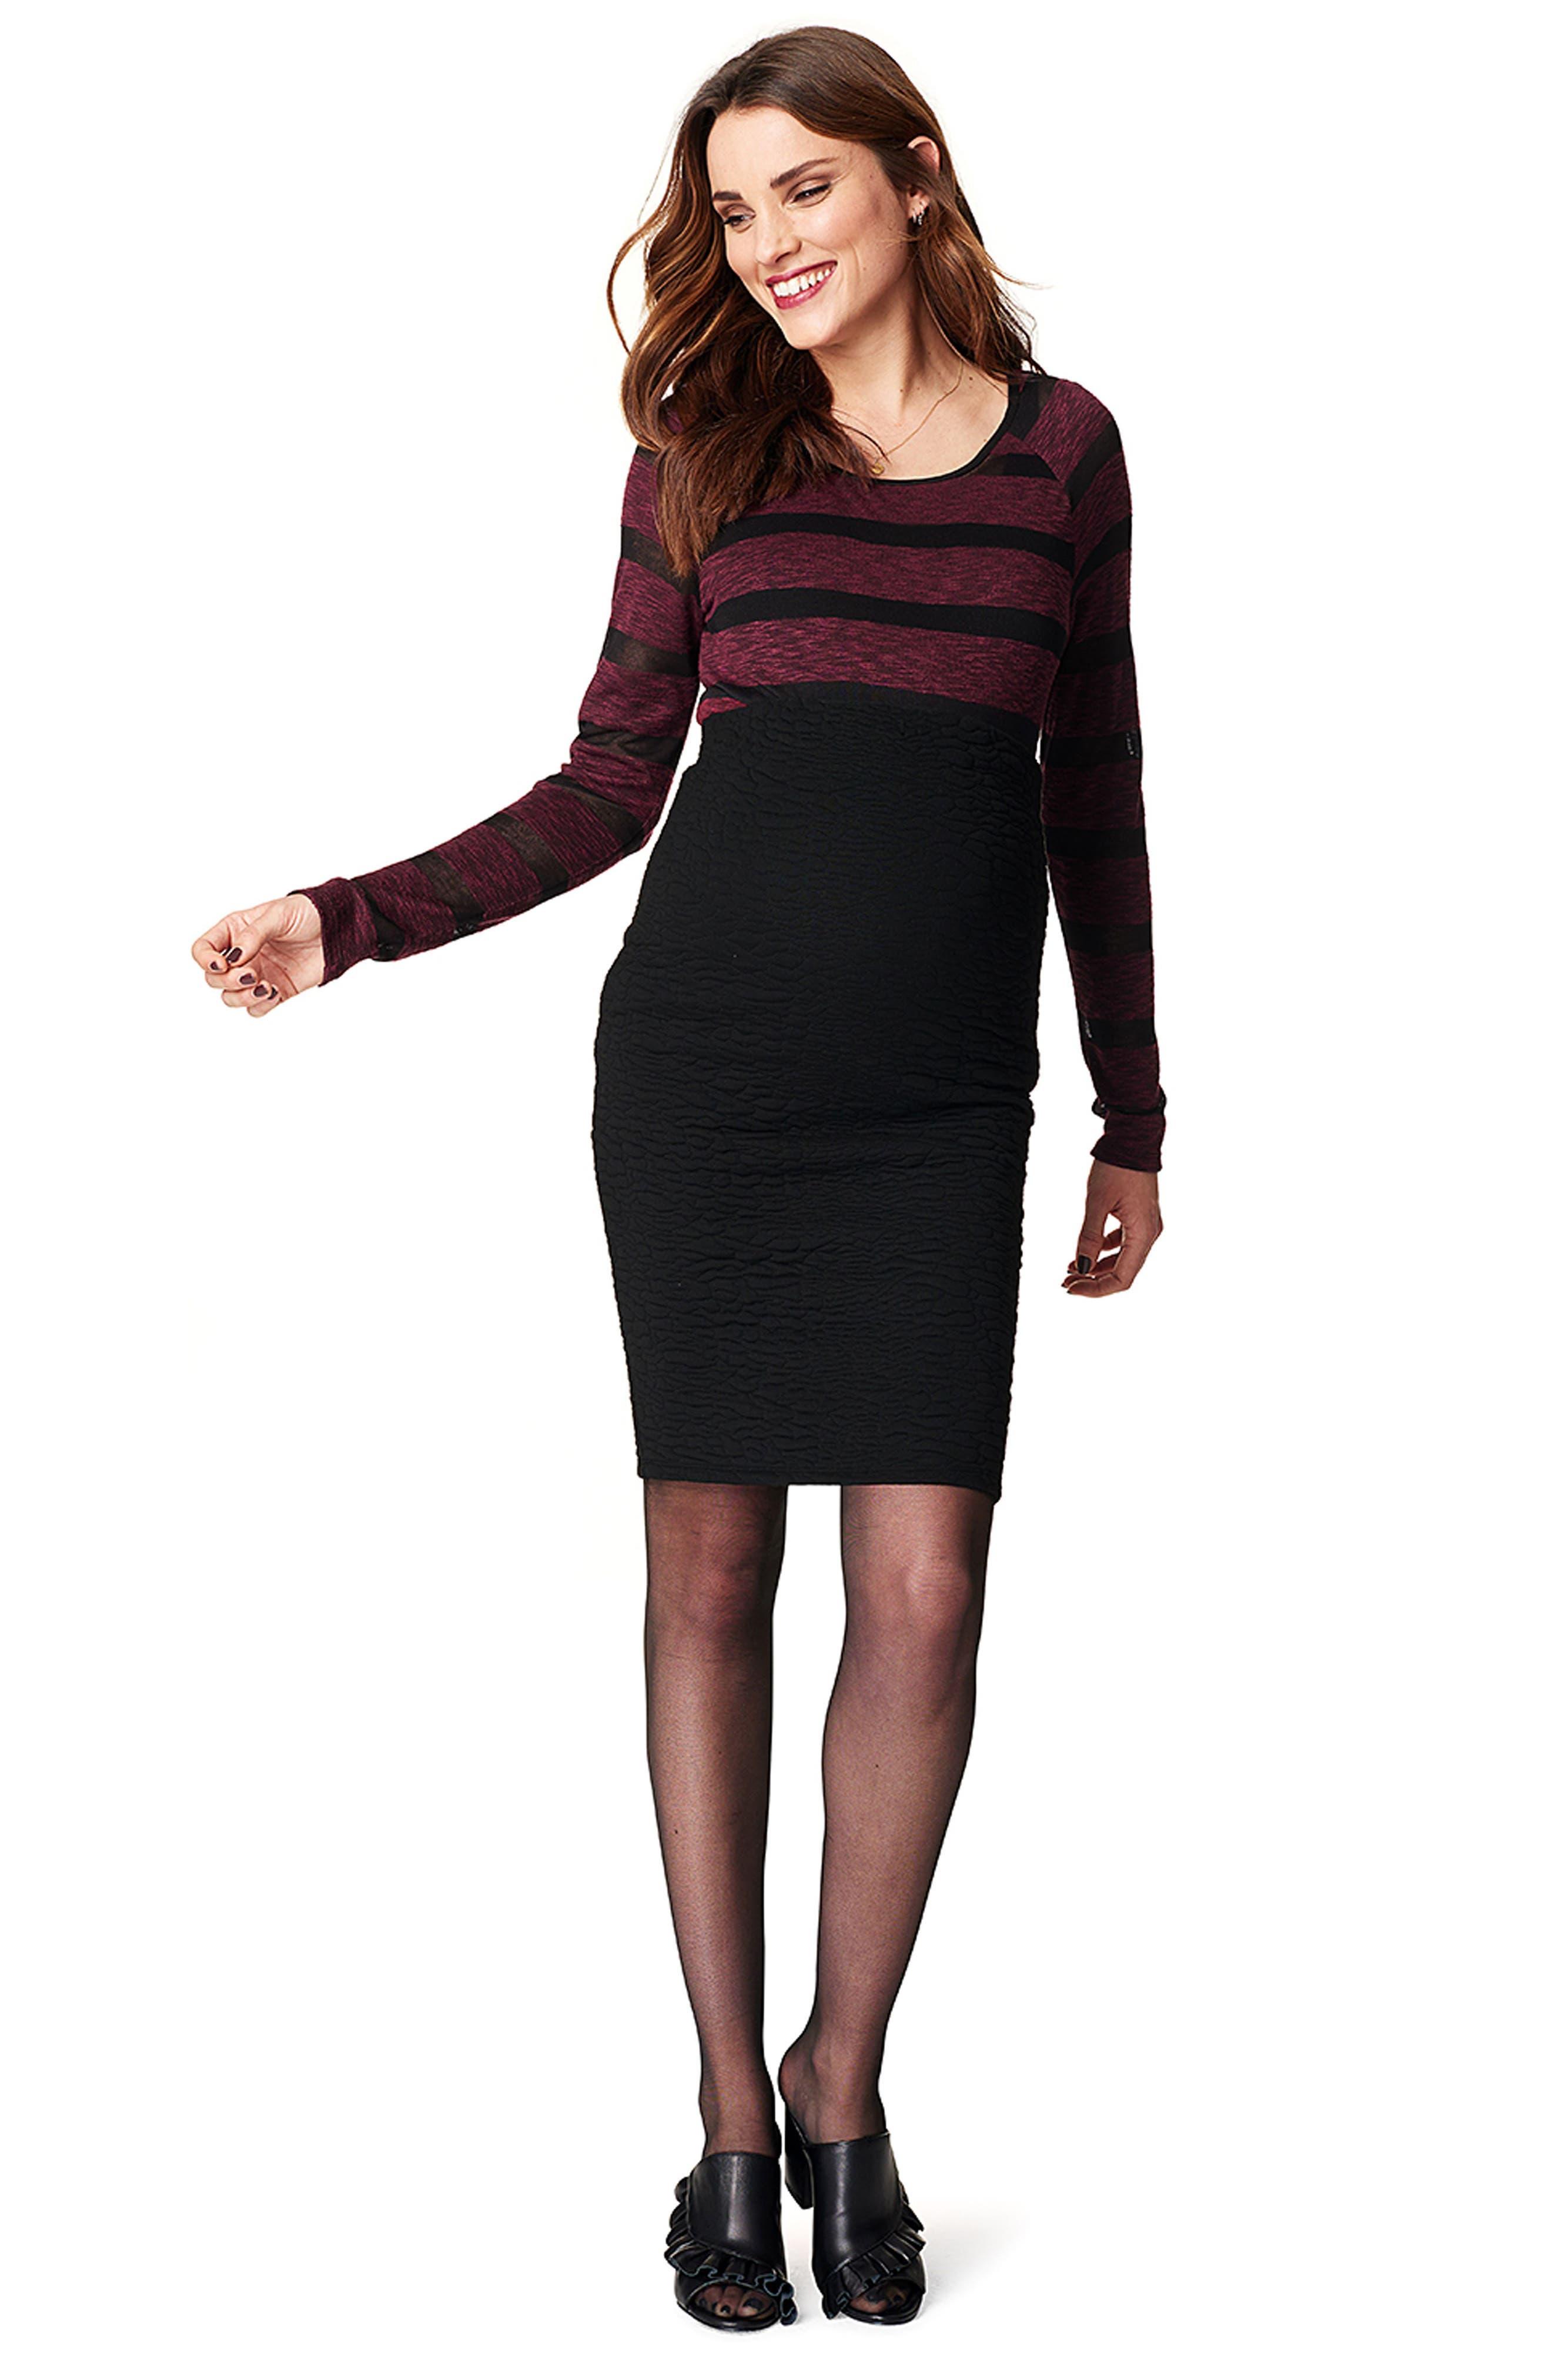 Jane Textured Knit Maternity Skirt,                             Alternate thumbnail 4, color,                             BLACK